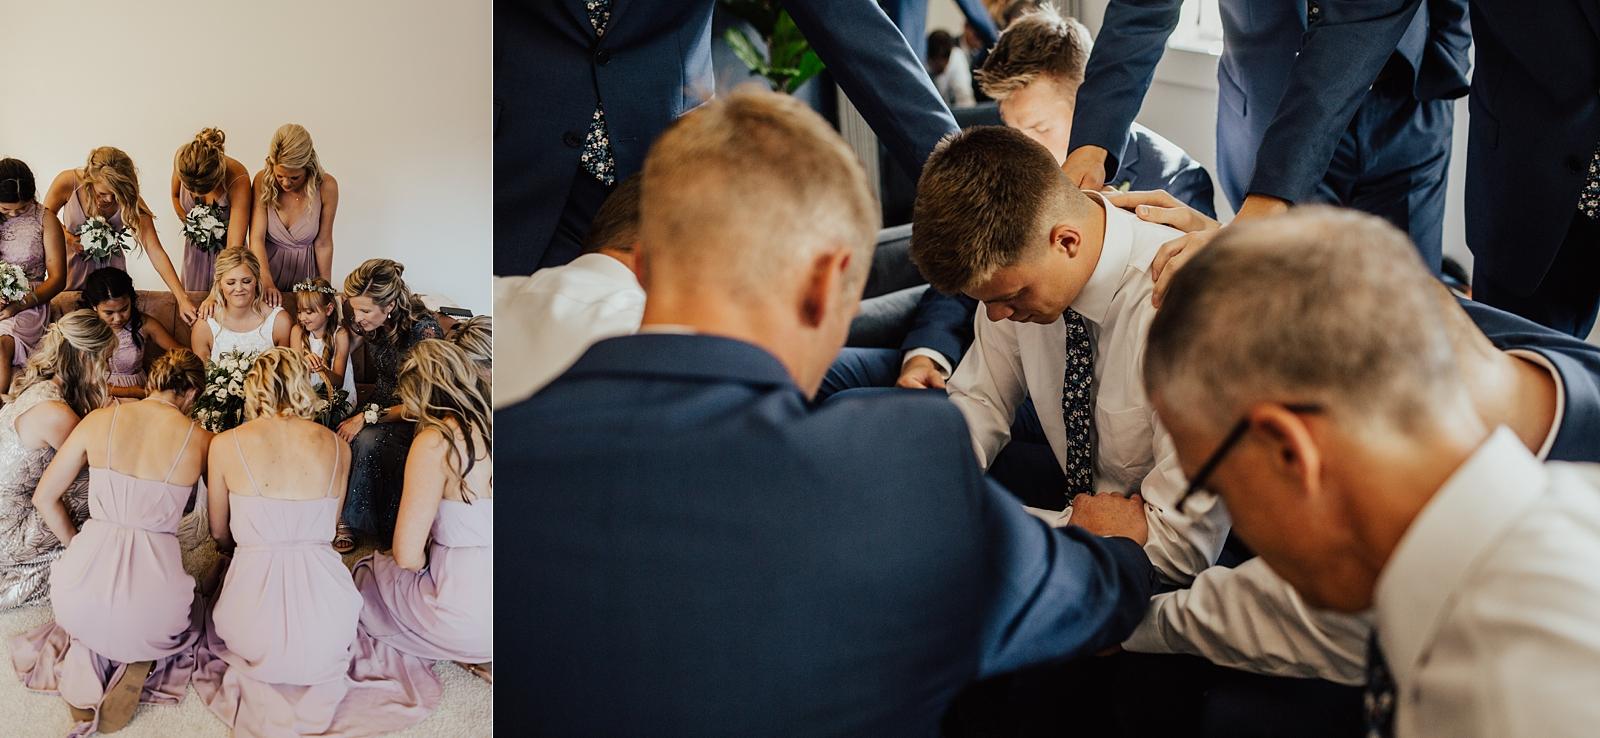 Anna & Trey Modern Minneapolis Wedding at The Hutton House_0711.jpg